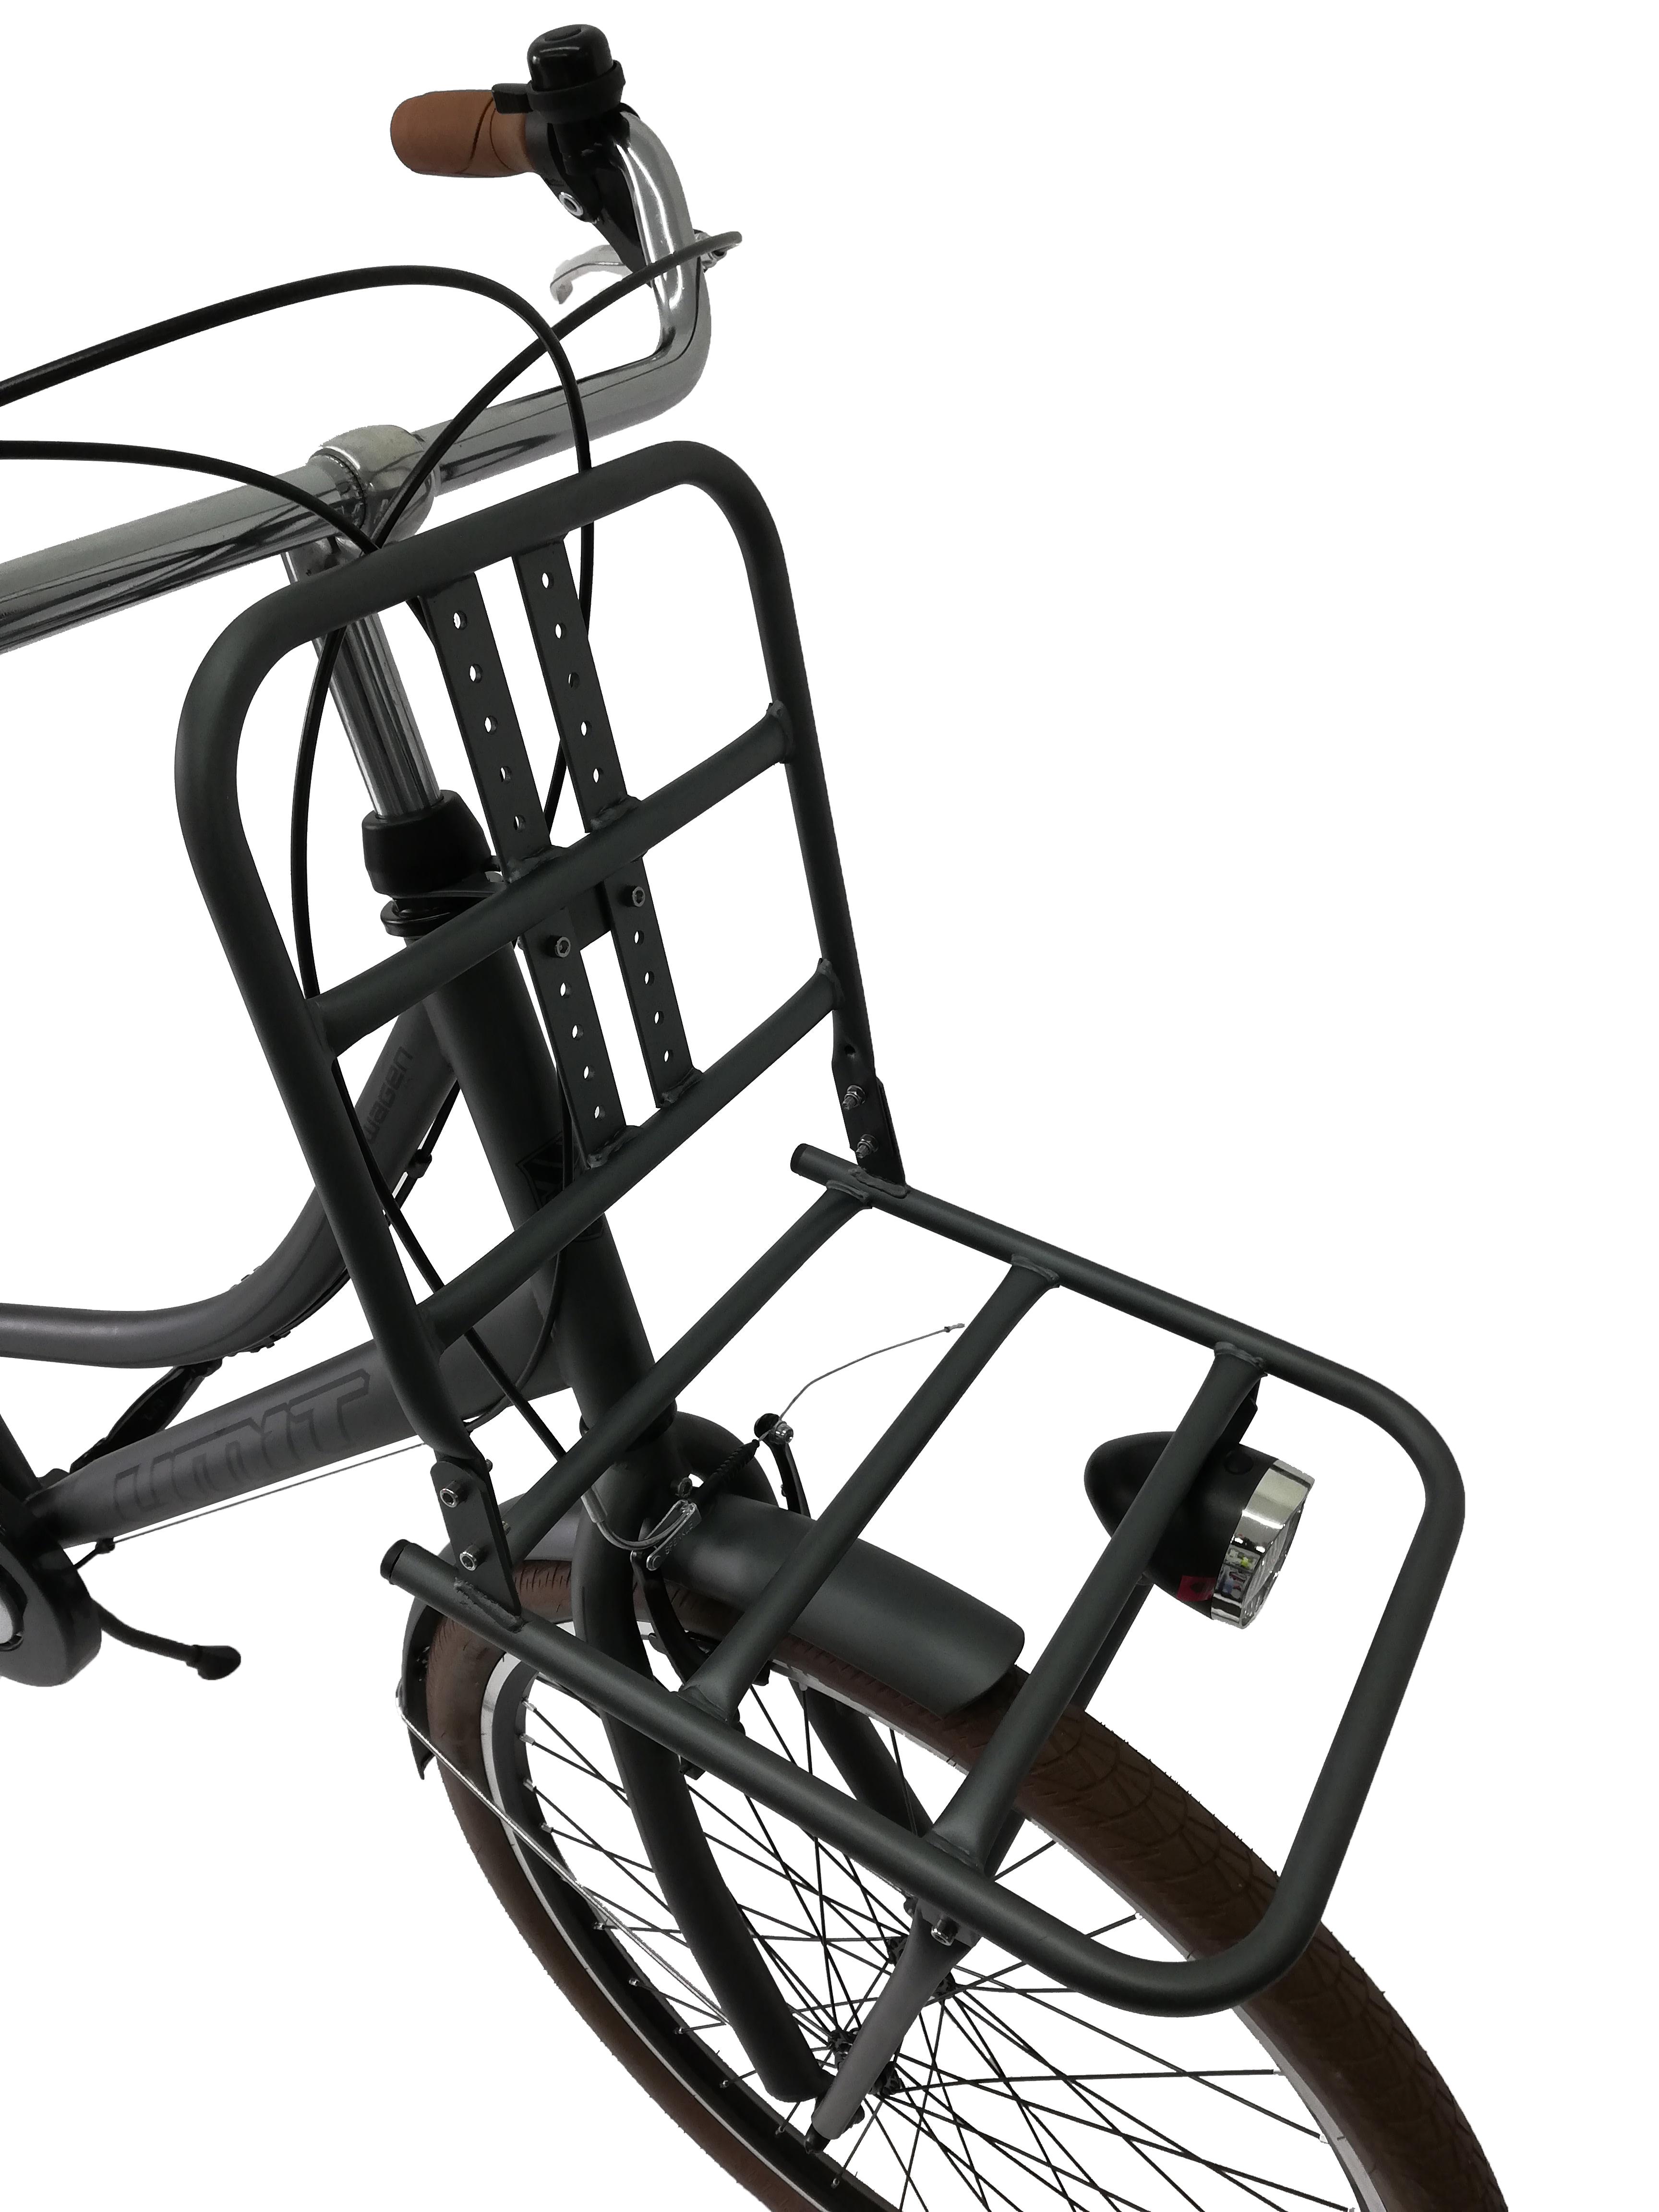 "Bicicleta City Umit Wagen Lady, Culoare Gri, Roata 26"" Otel [1]"